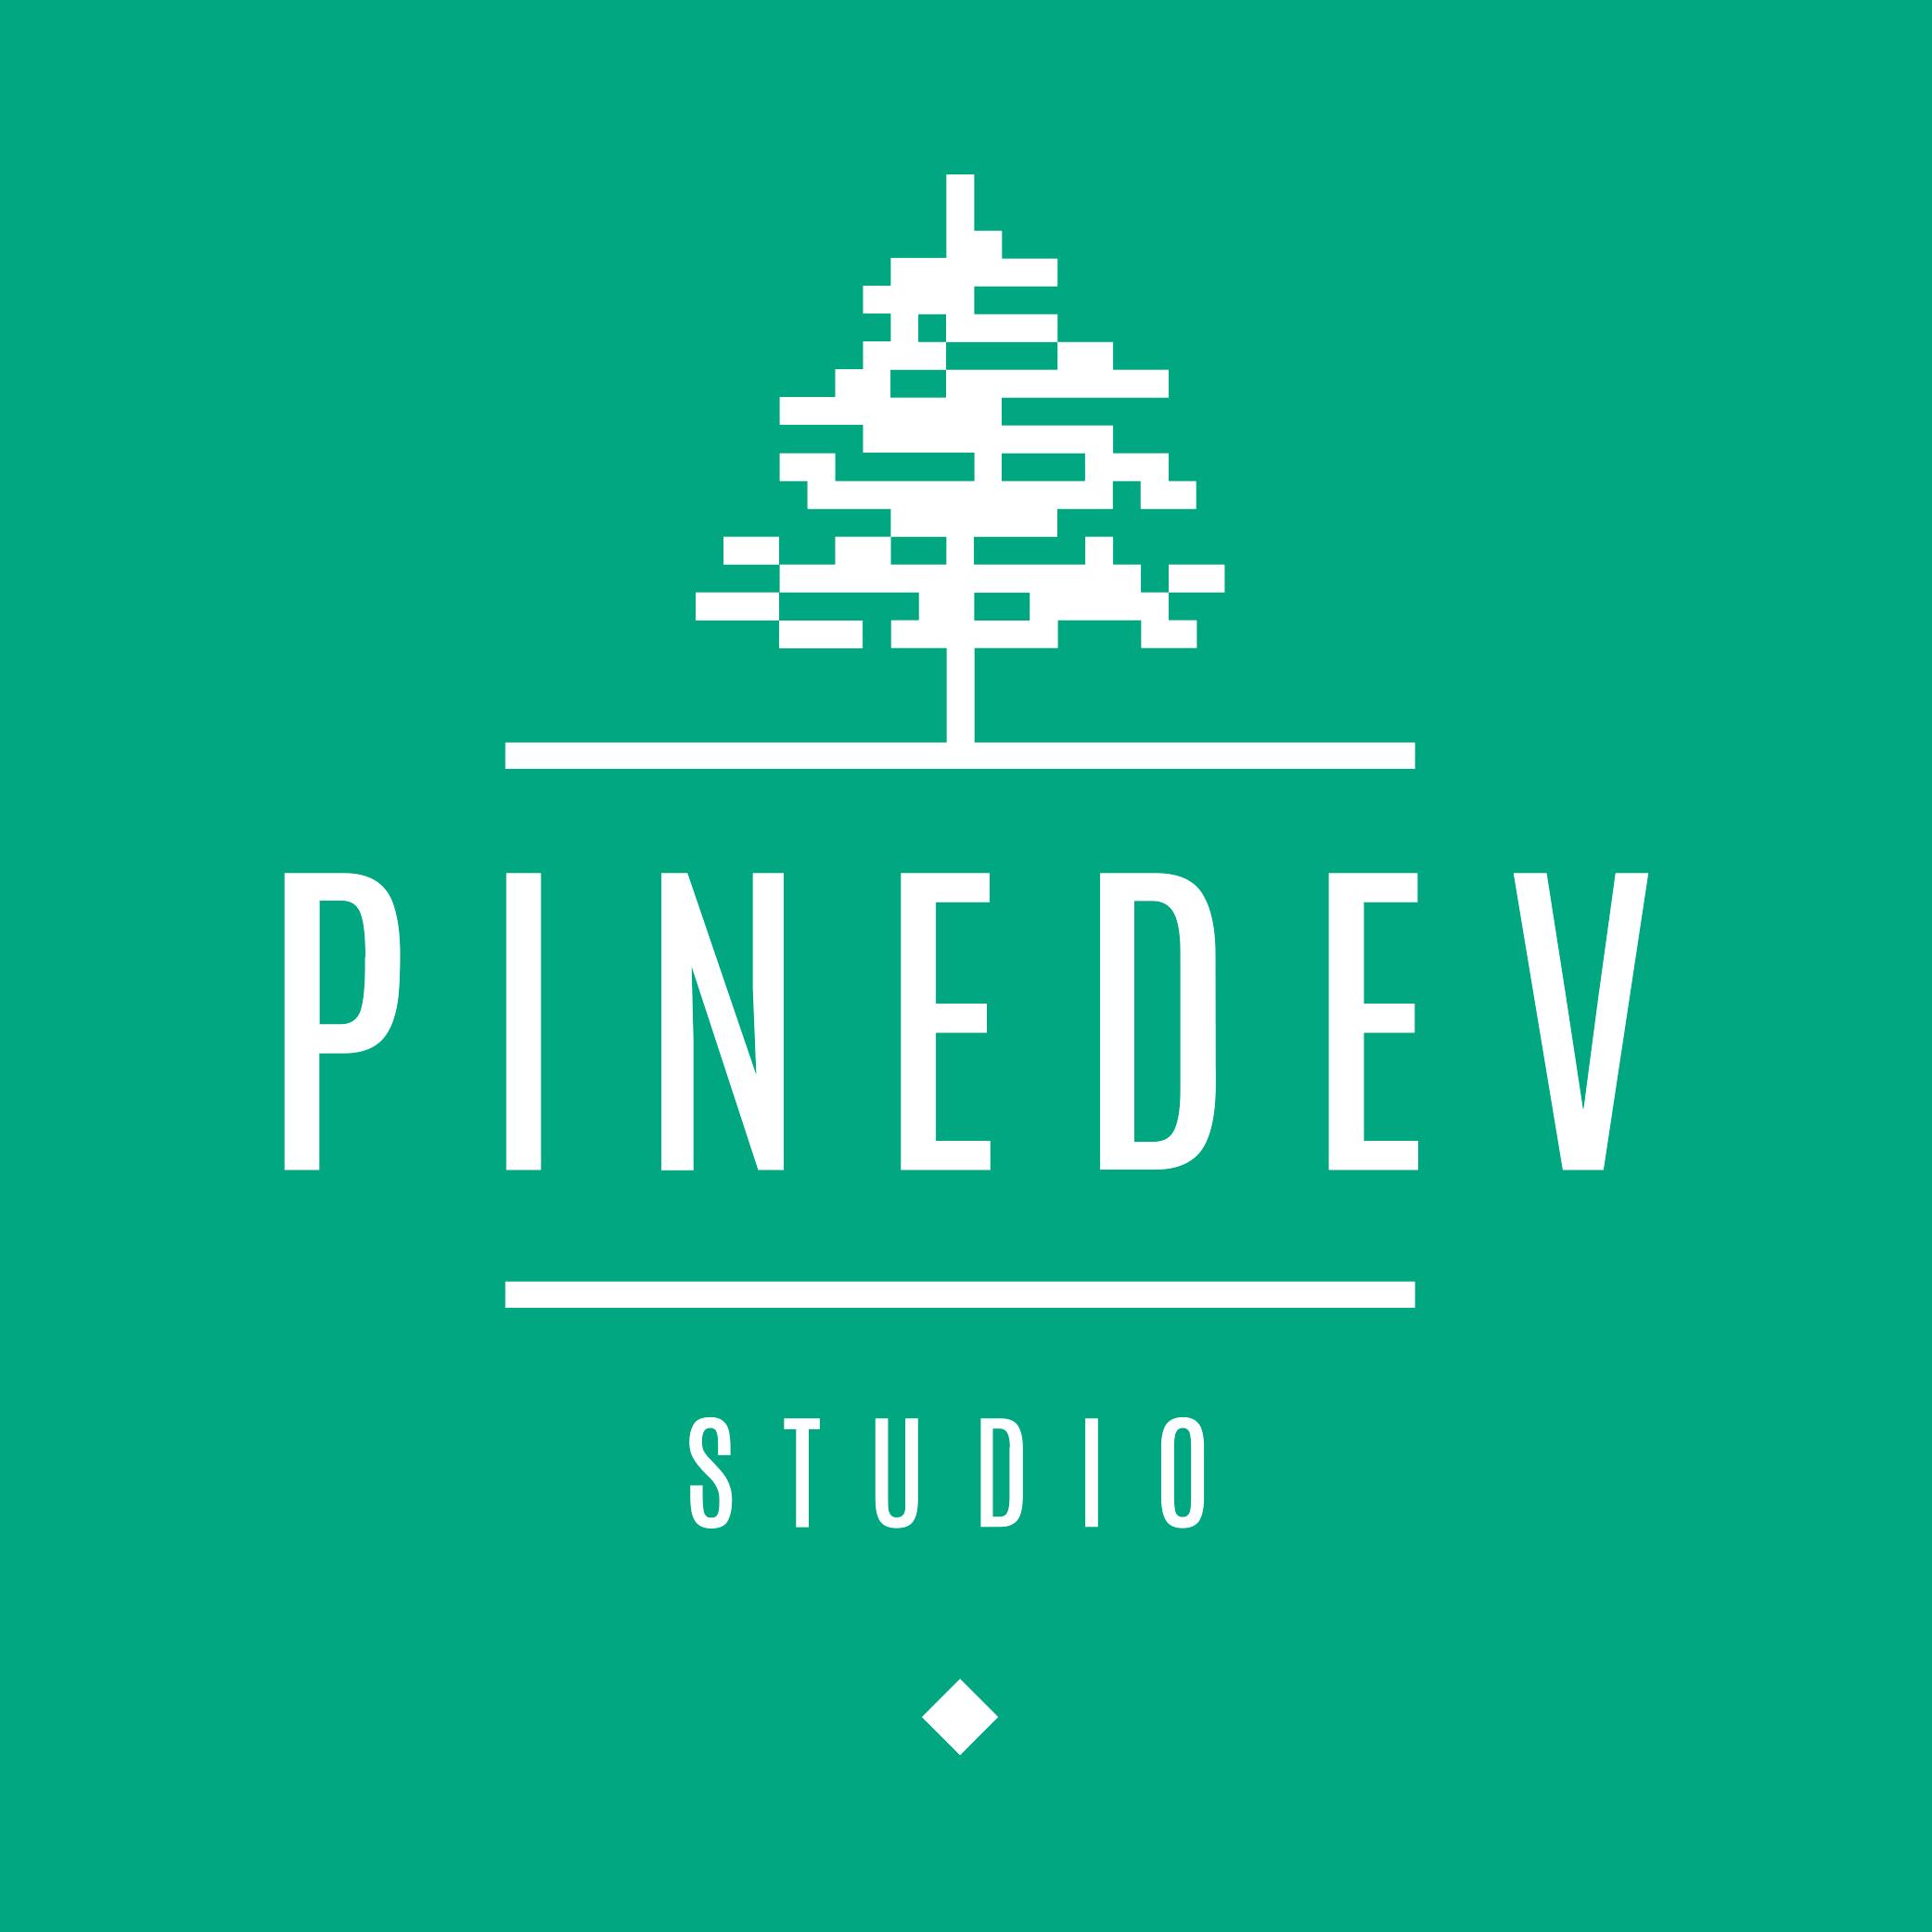 PineDev Studio Logo